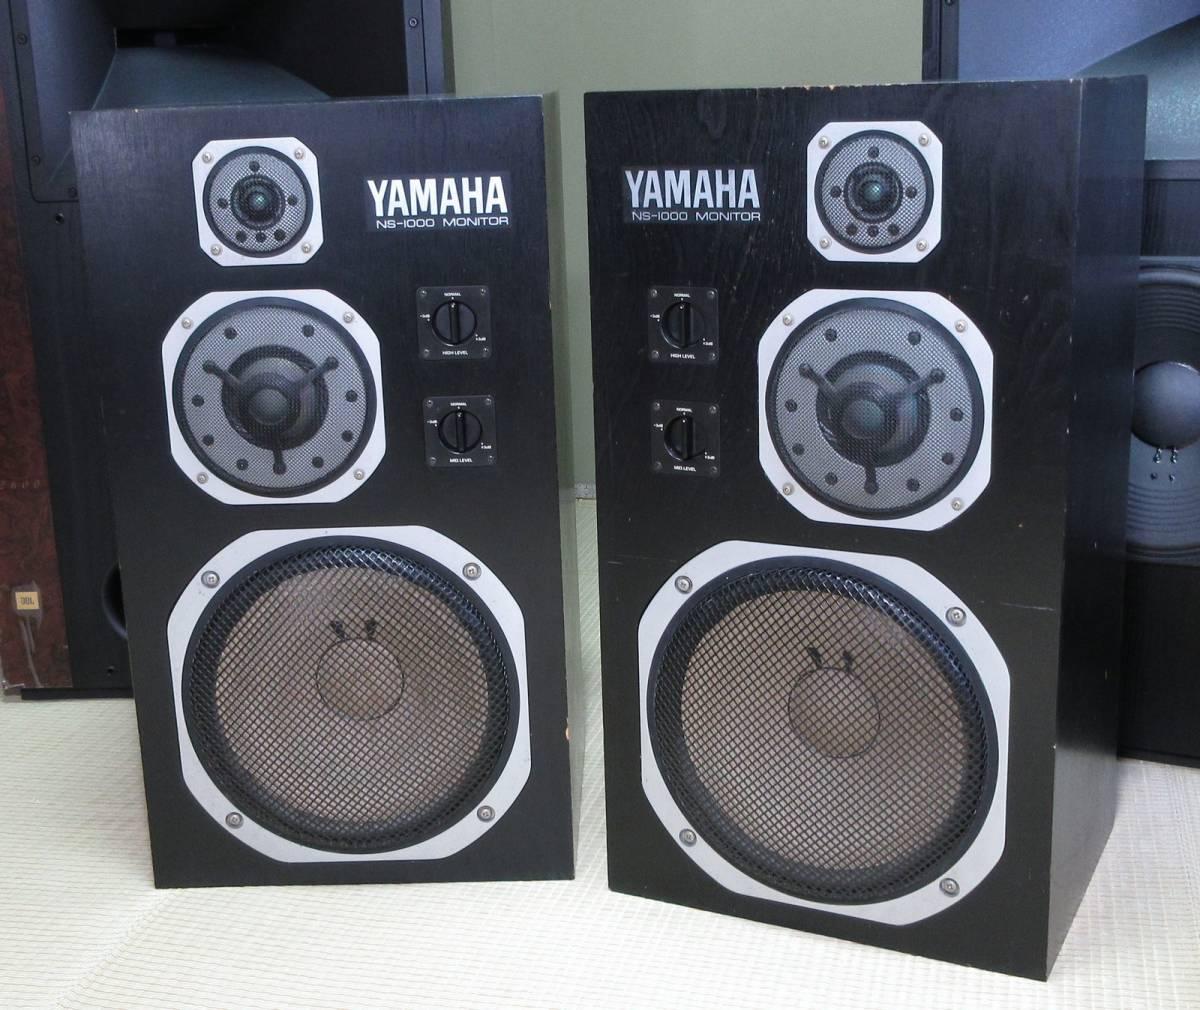 YAMAHA NS-1000M MONITOR スピーカー ペア ヤマハ 北海道引取限定か落札者様による配送会社の手配_画像2